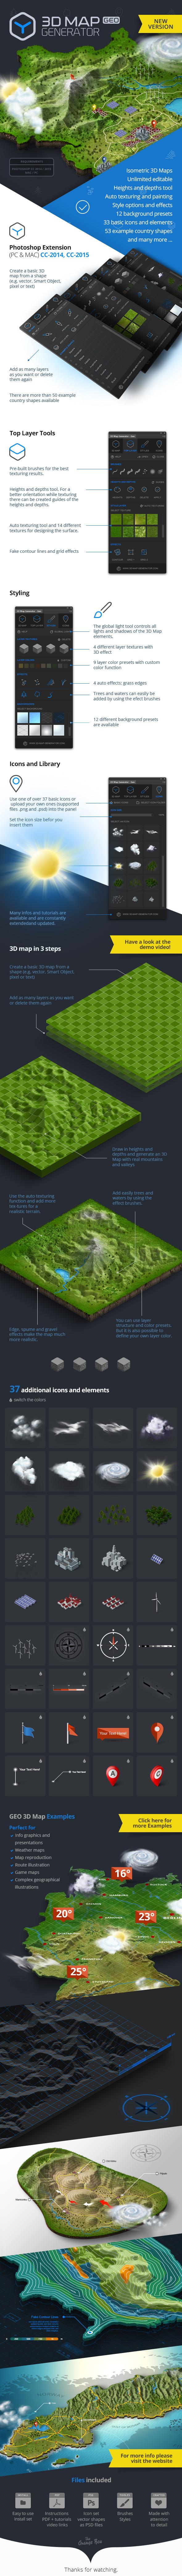 3D Map Generator - GEO - Utilities Actions | Web and Design | Map